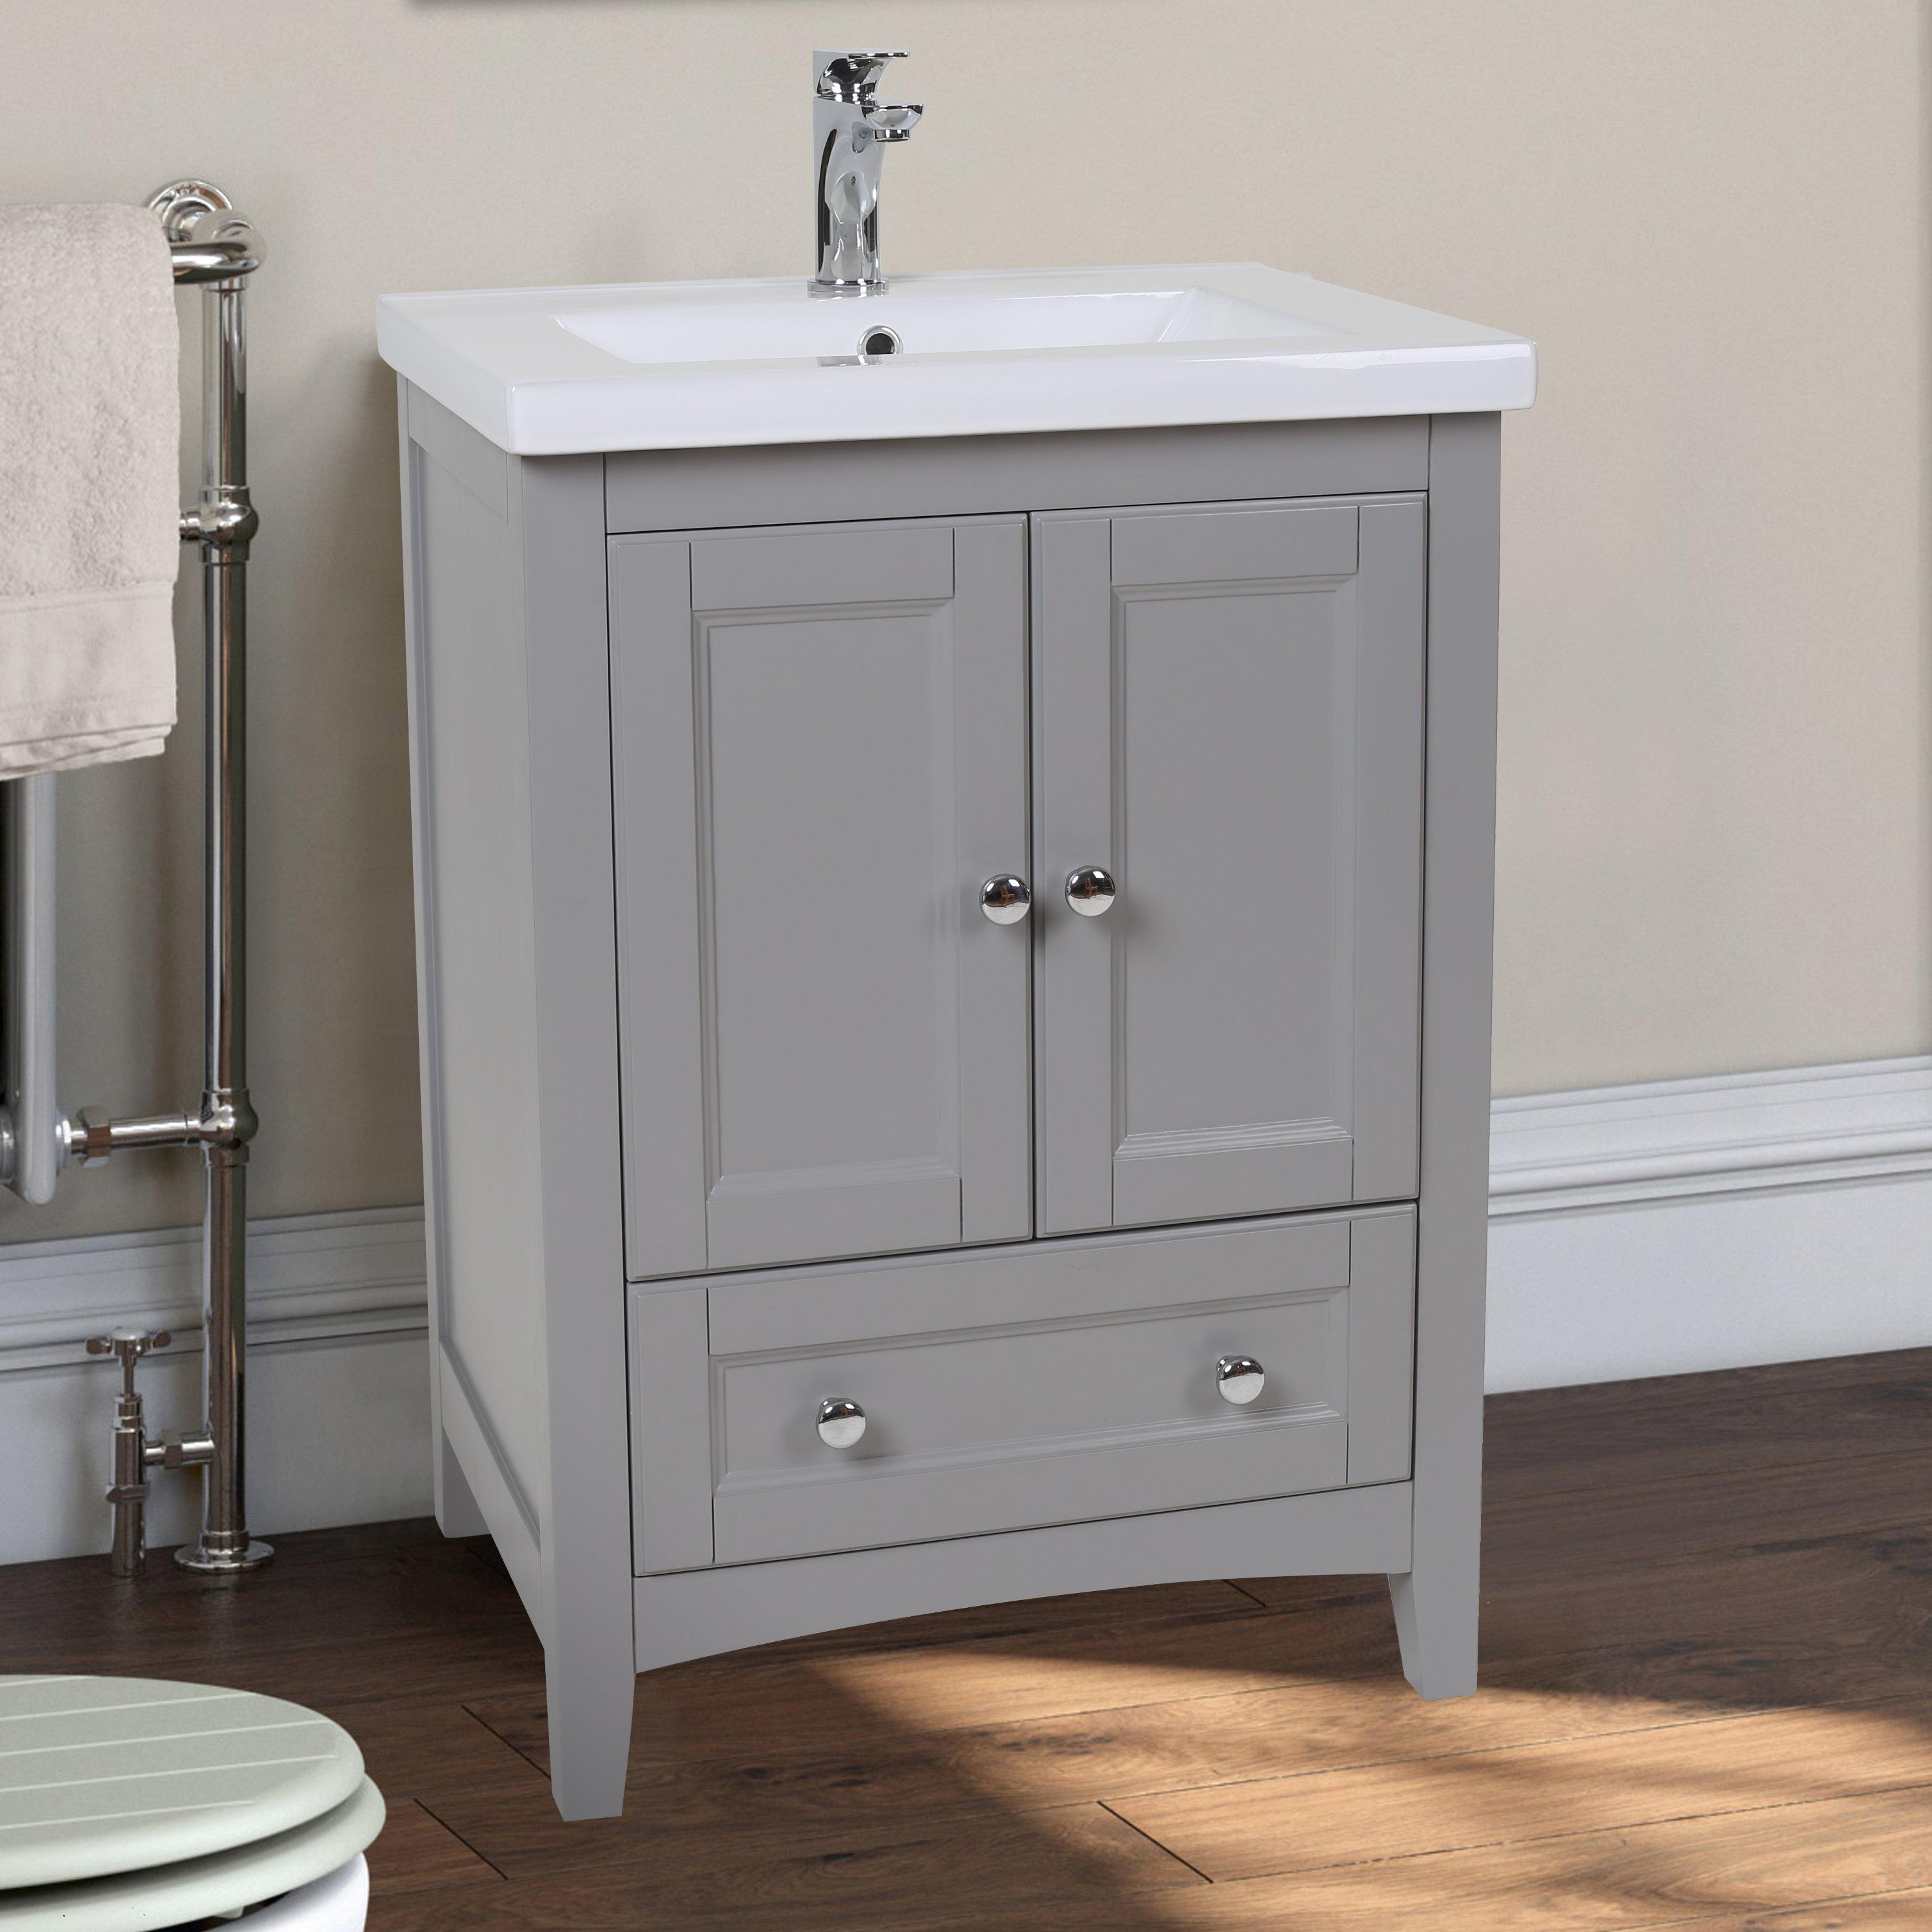 idea vanity sink lowes bathroom white single delancy undermount inch spectacular allen homey roth shop vanover